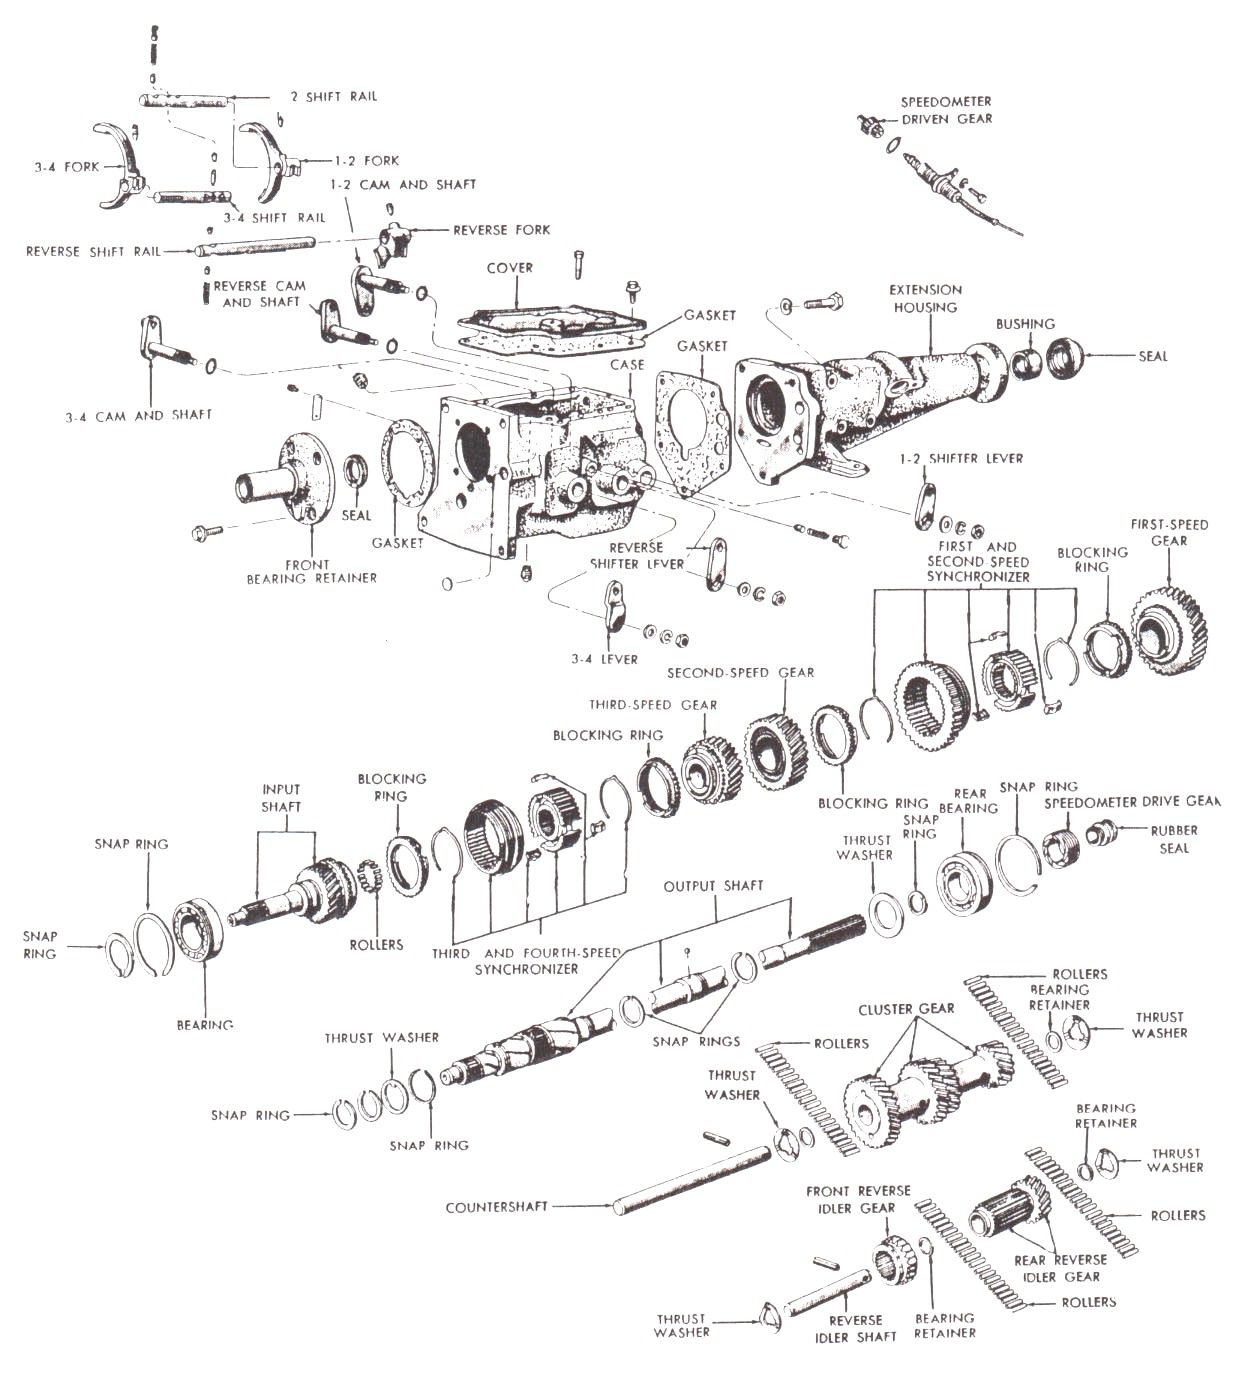 hight resolution of ih 584 wiring diagram wiring library784 international tractor wiring diagram international 244